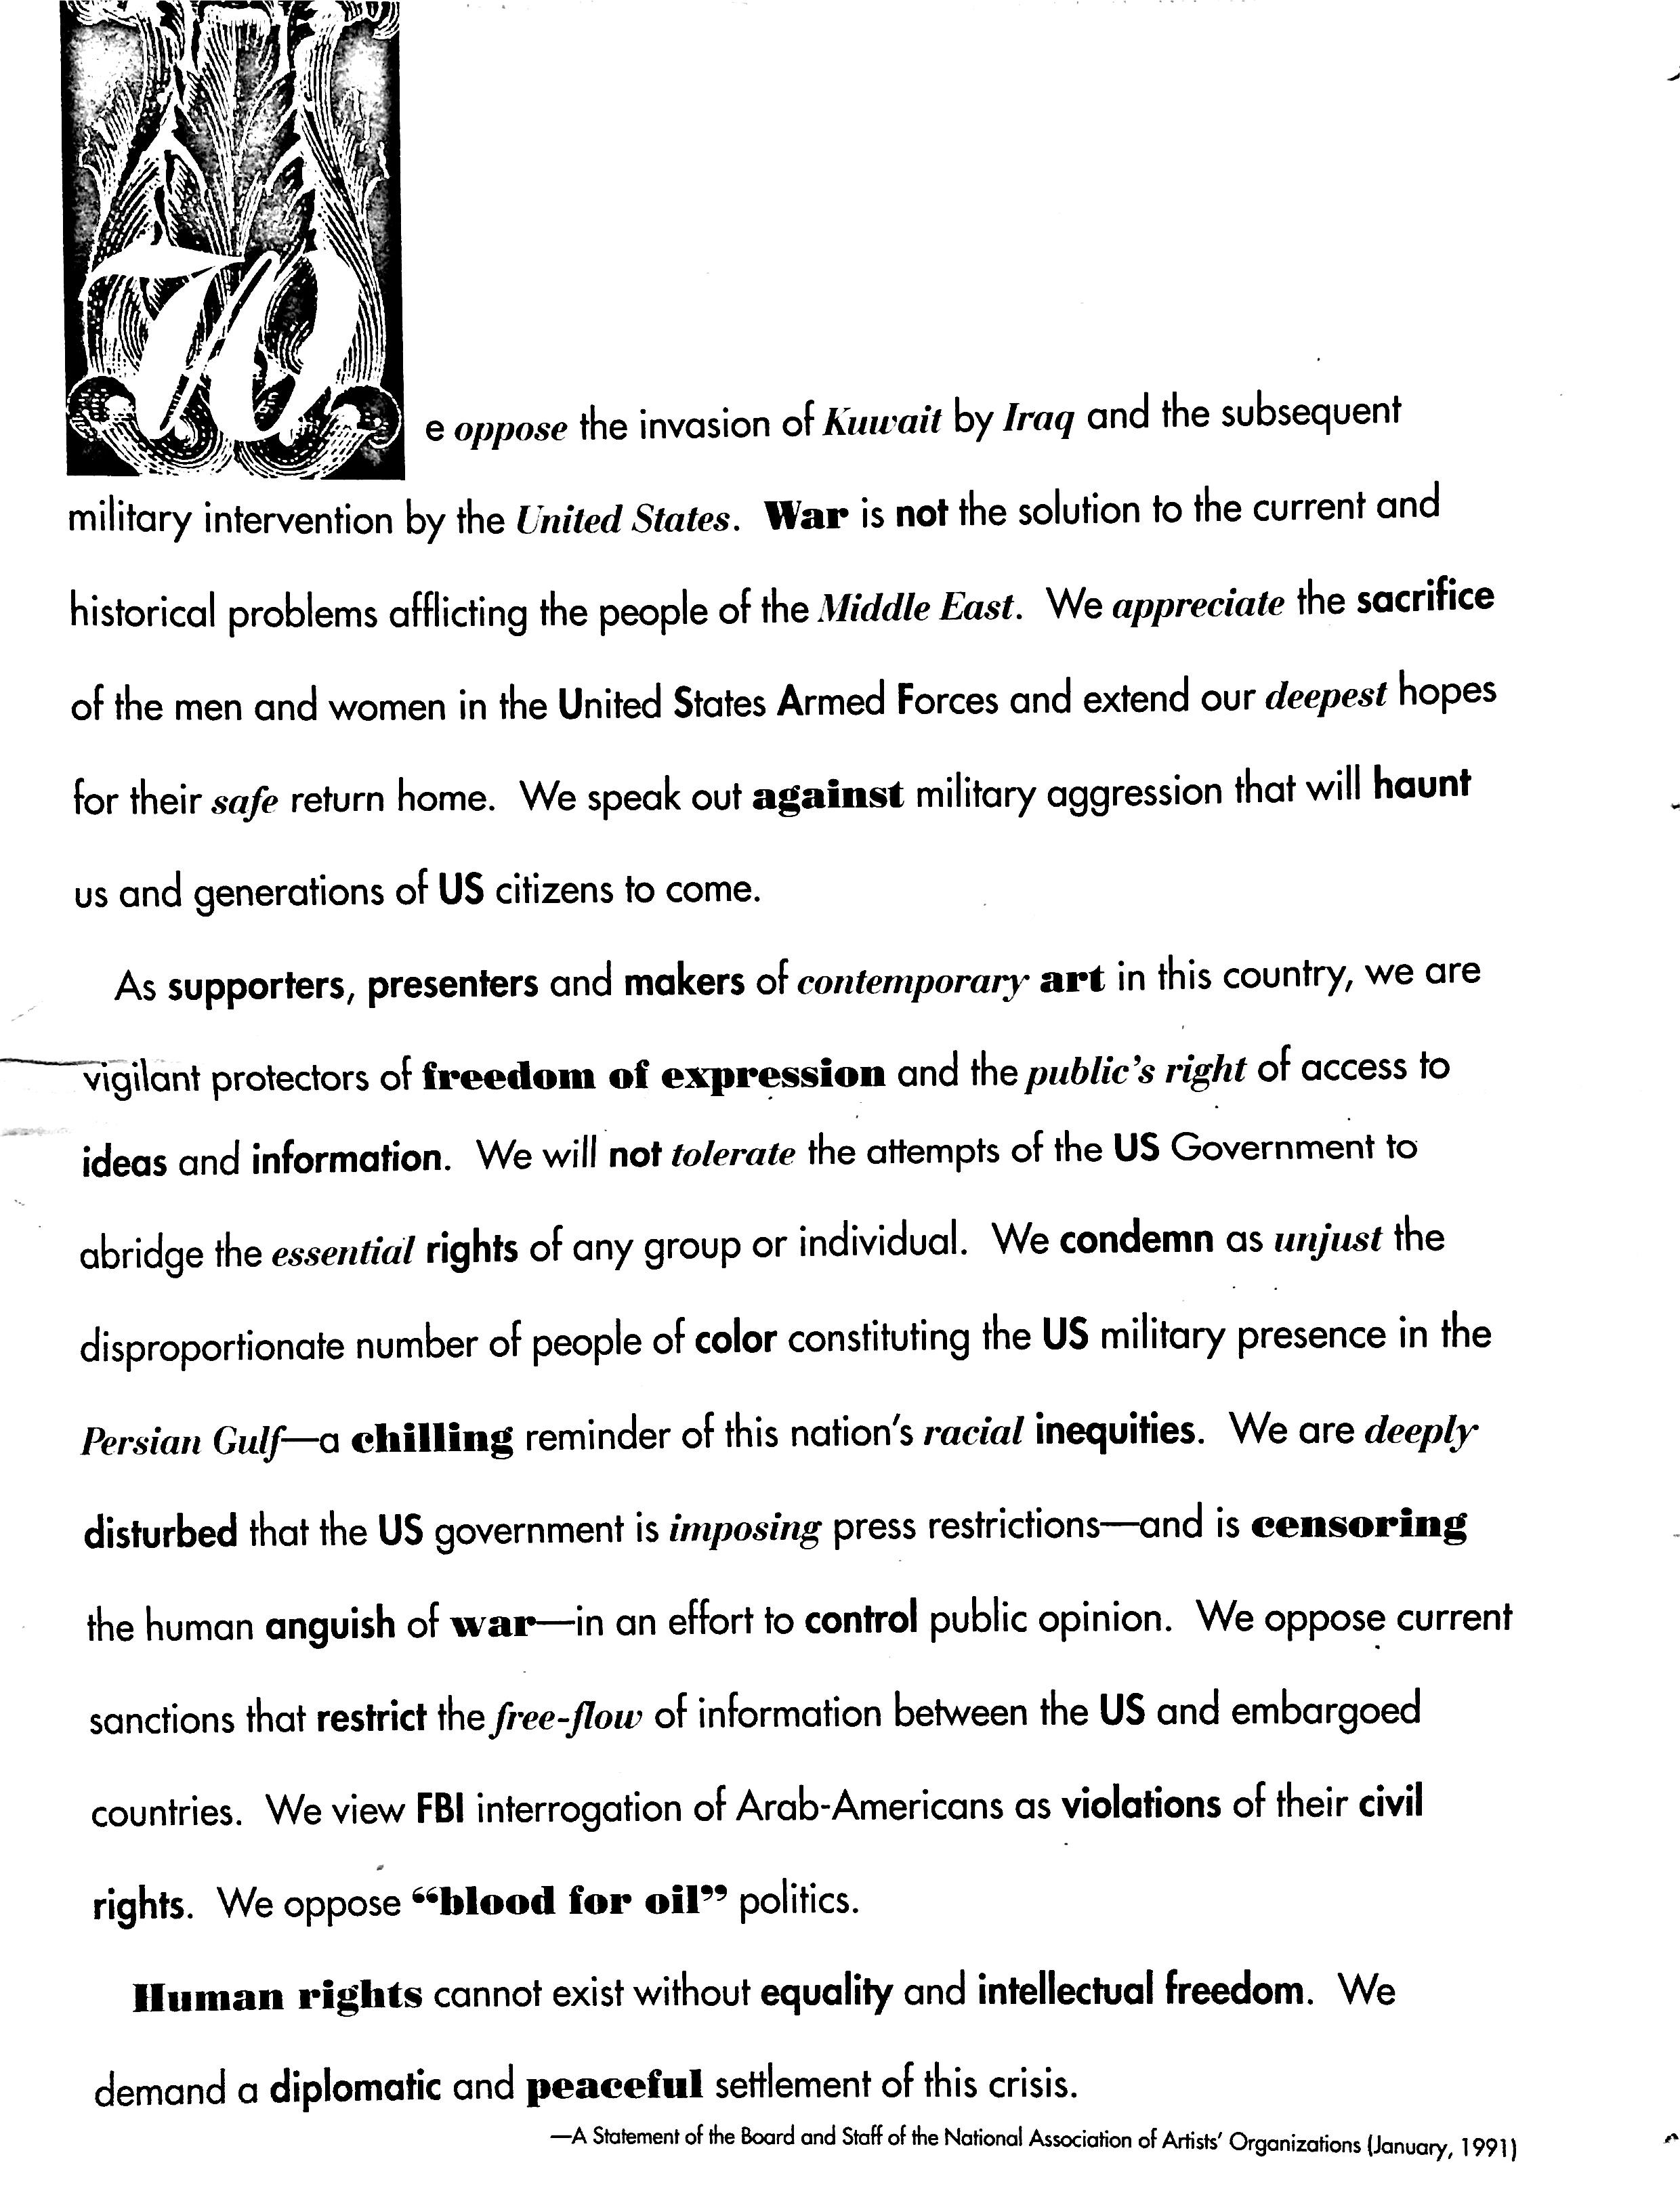 January 1991 - NAAO Bulletin Page 1.jpg